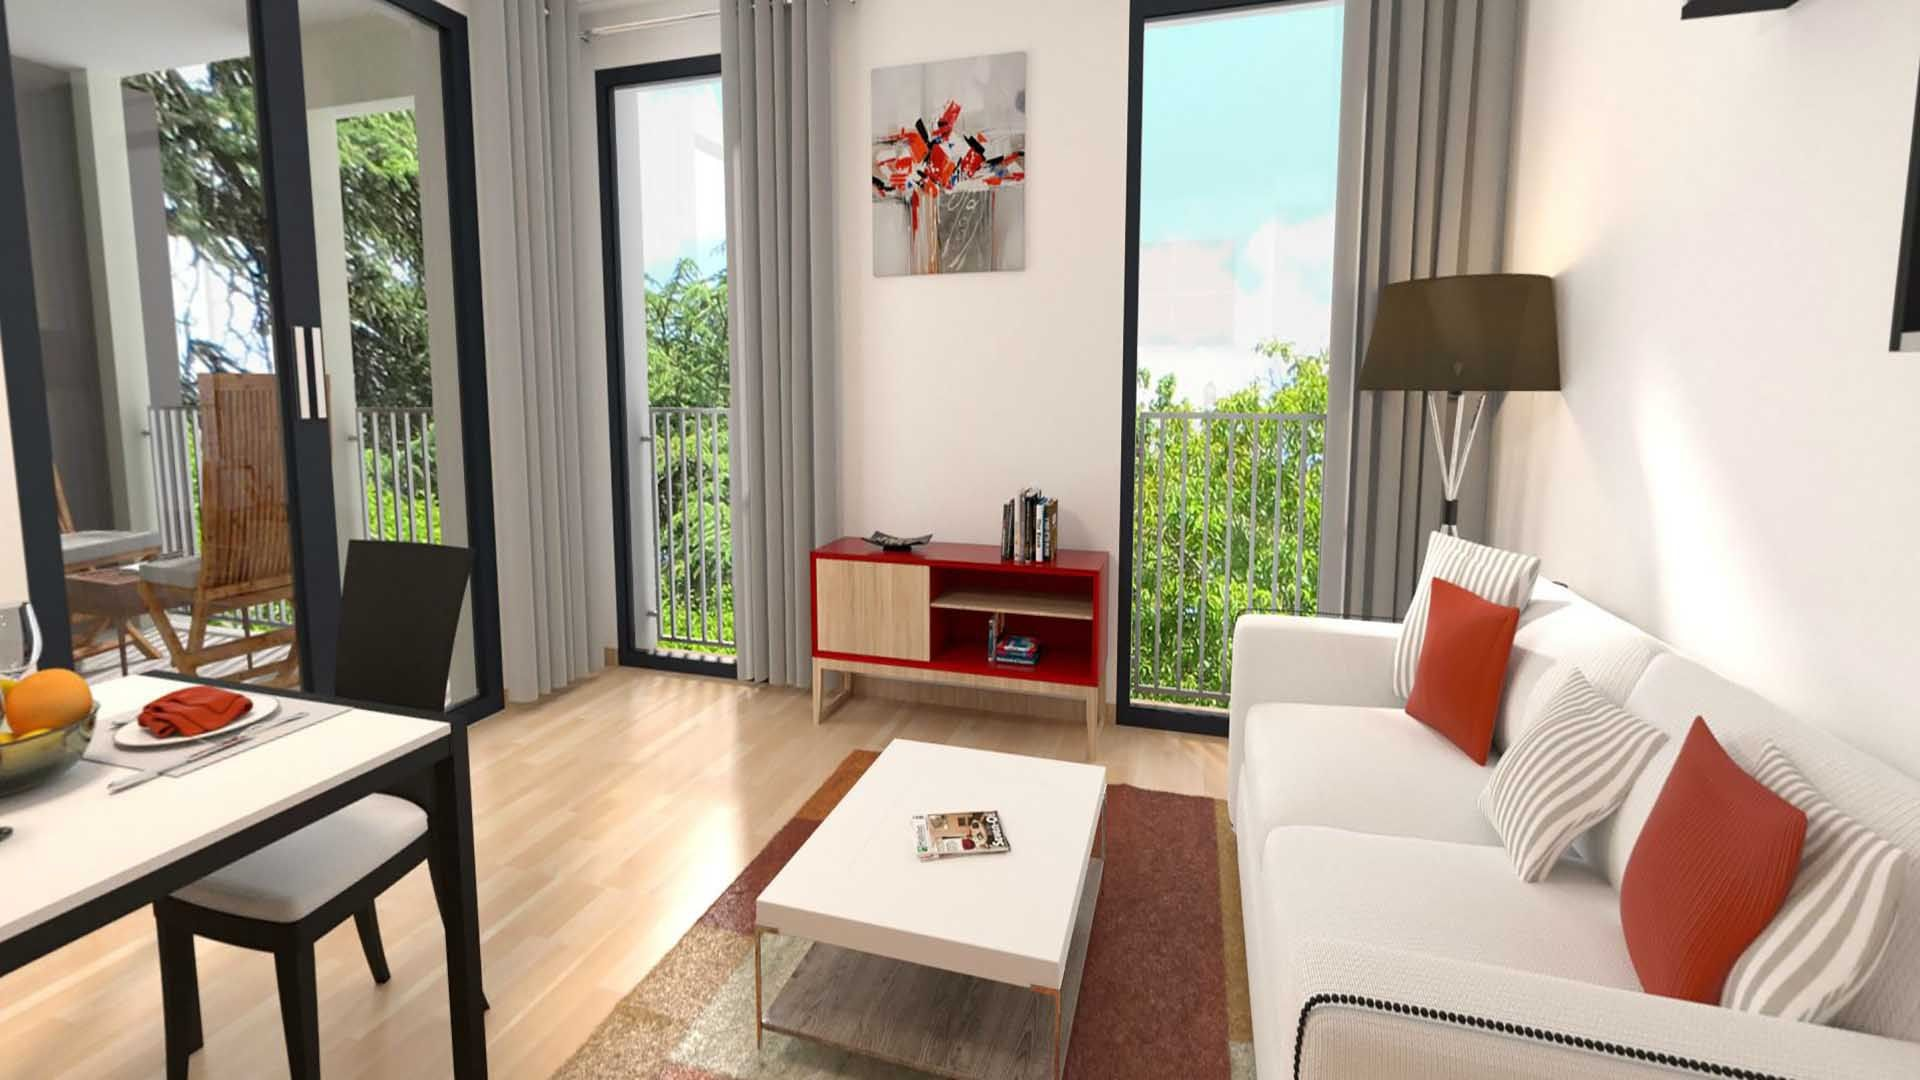 s r nit programme immobilier neuf villenave d 39 ornon. Black Bedroom Furniture Sets. Home Design Ideas